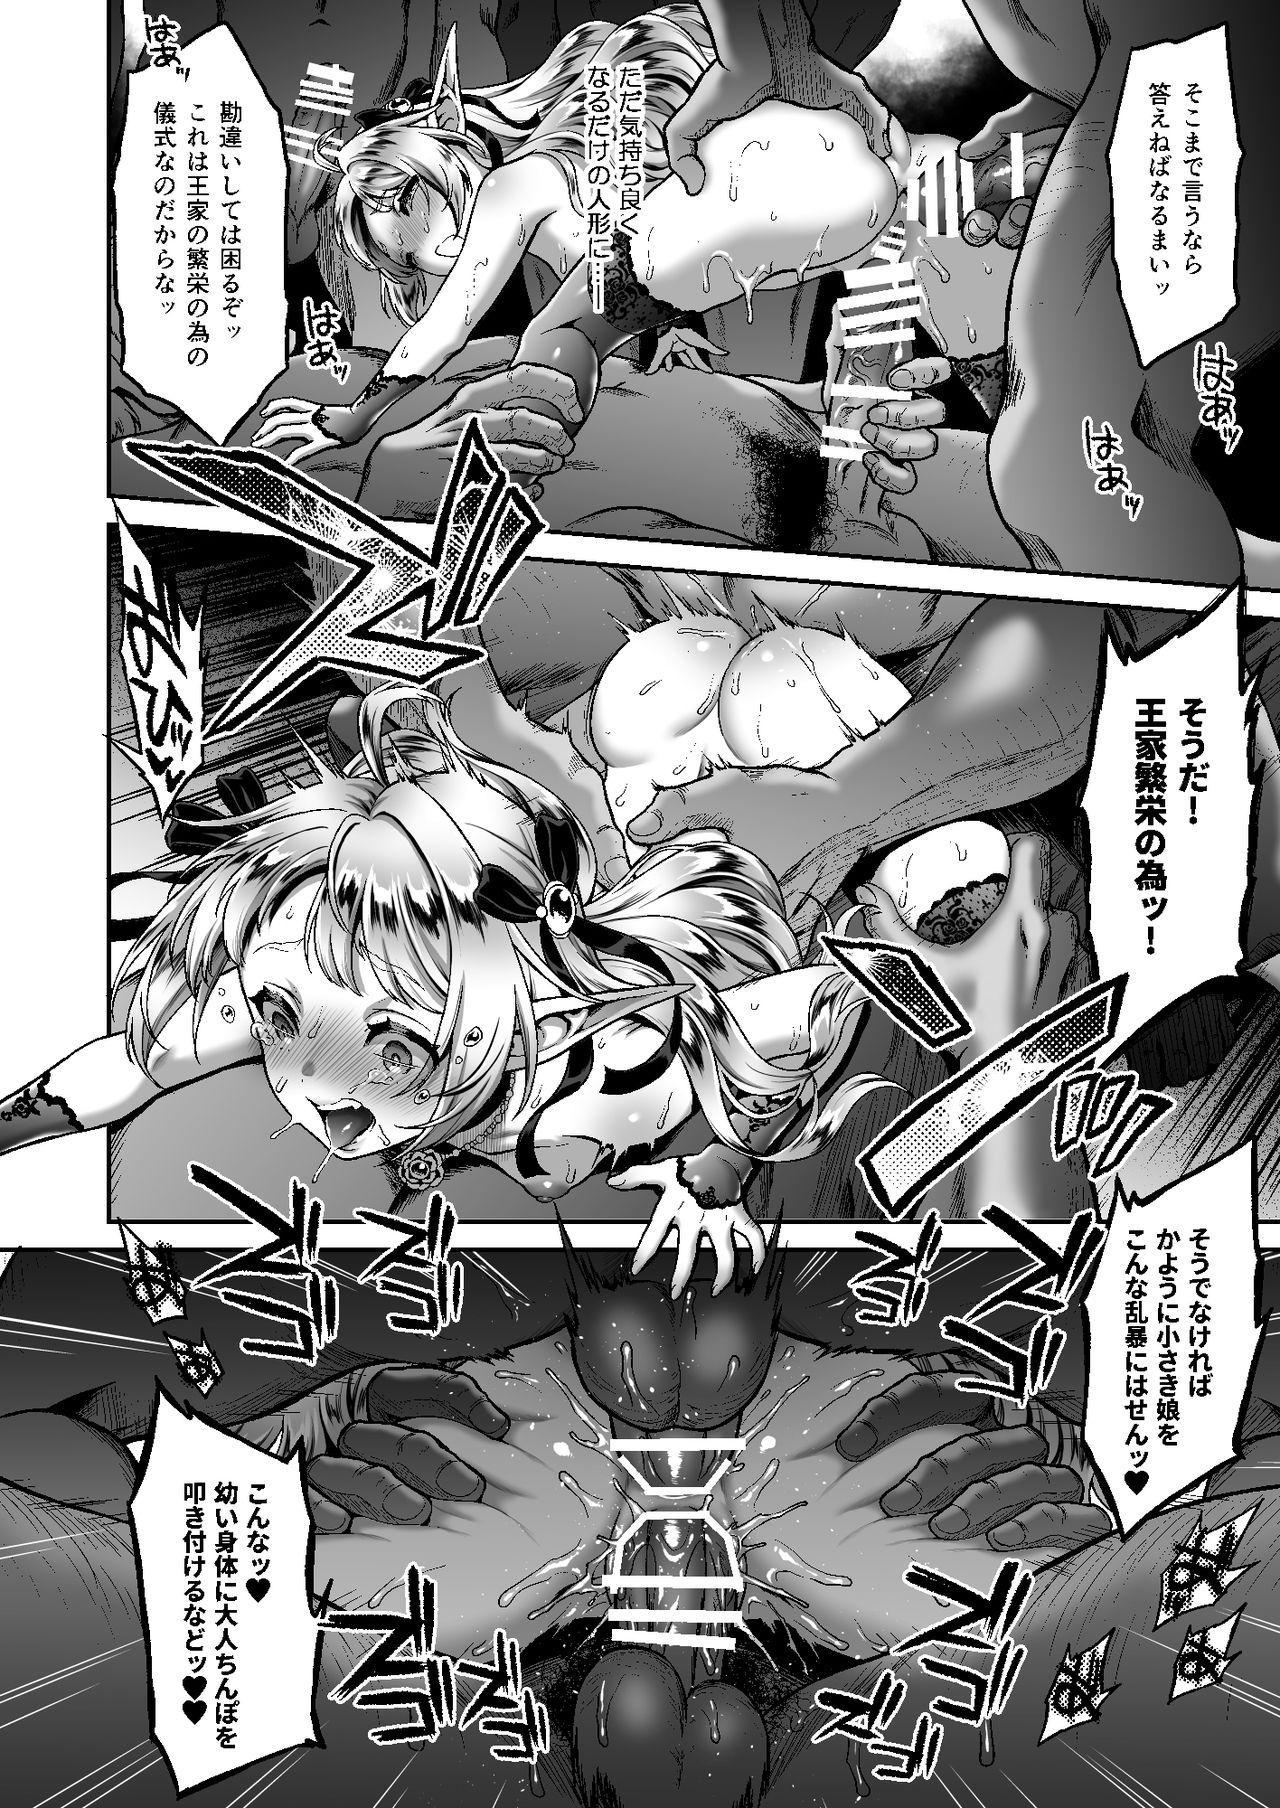 Tasogare no Shou Elf 6 - The story of Emma's side 25